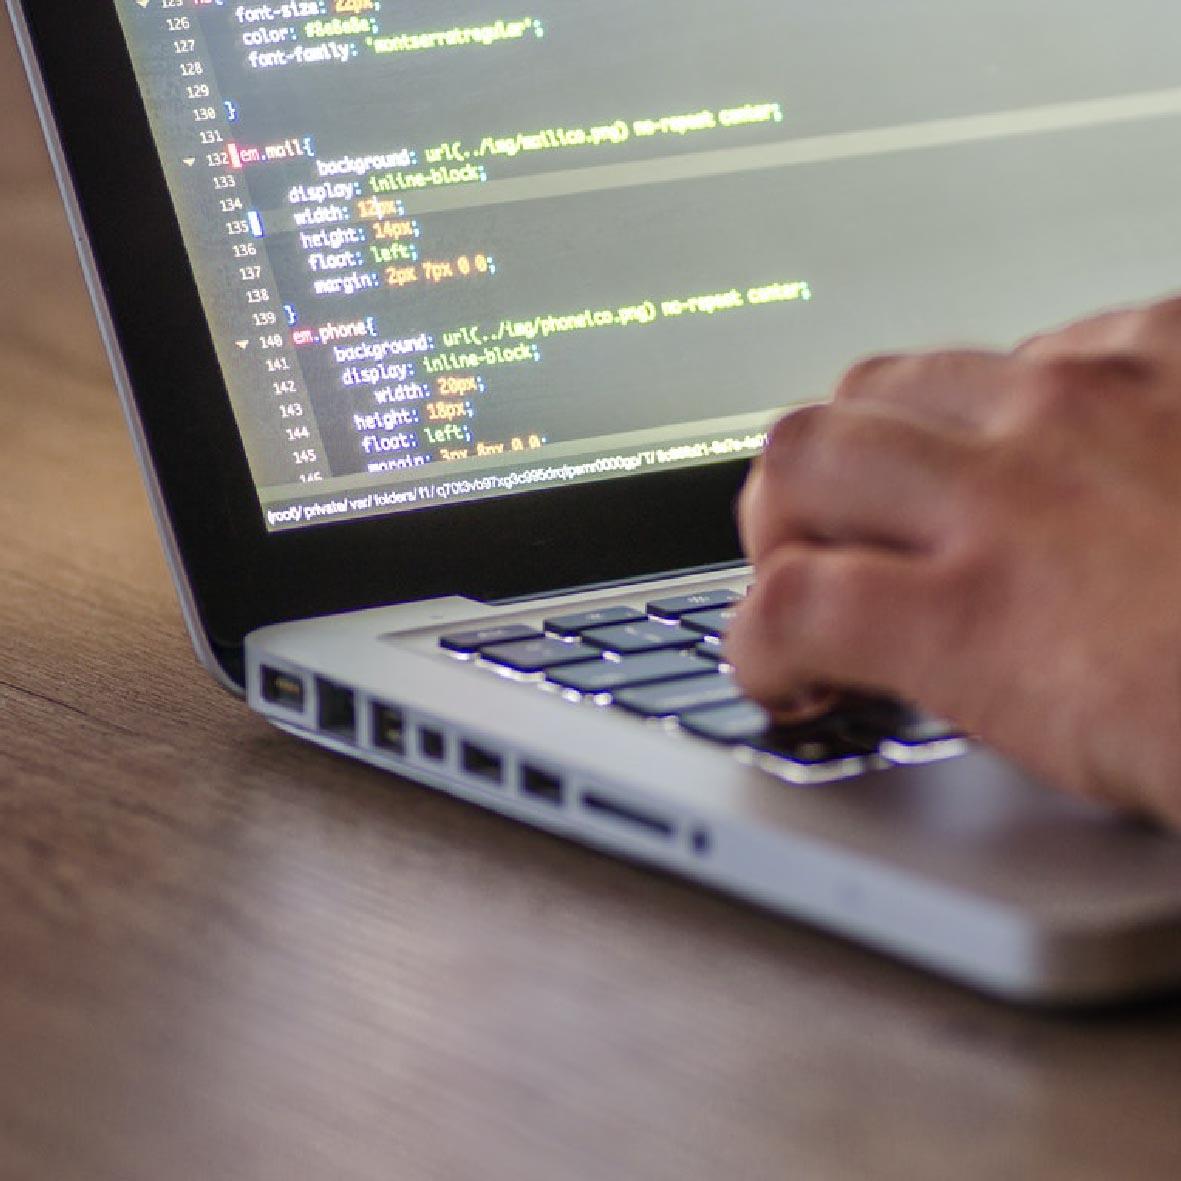 Tentang Profesi: WEB DEVELOPER